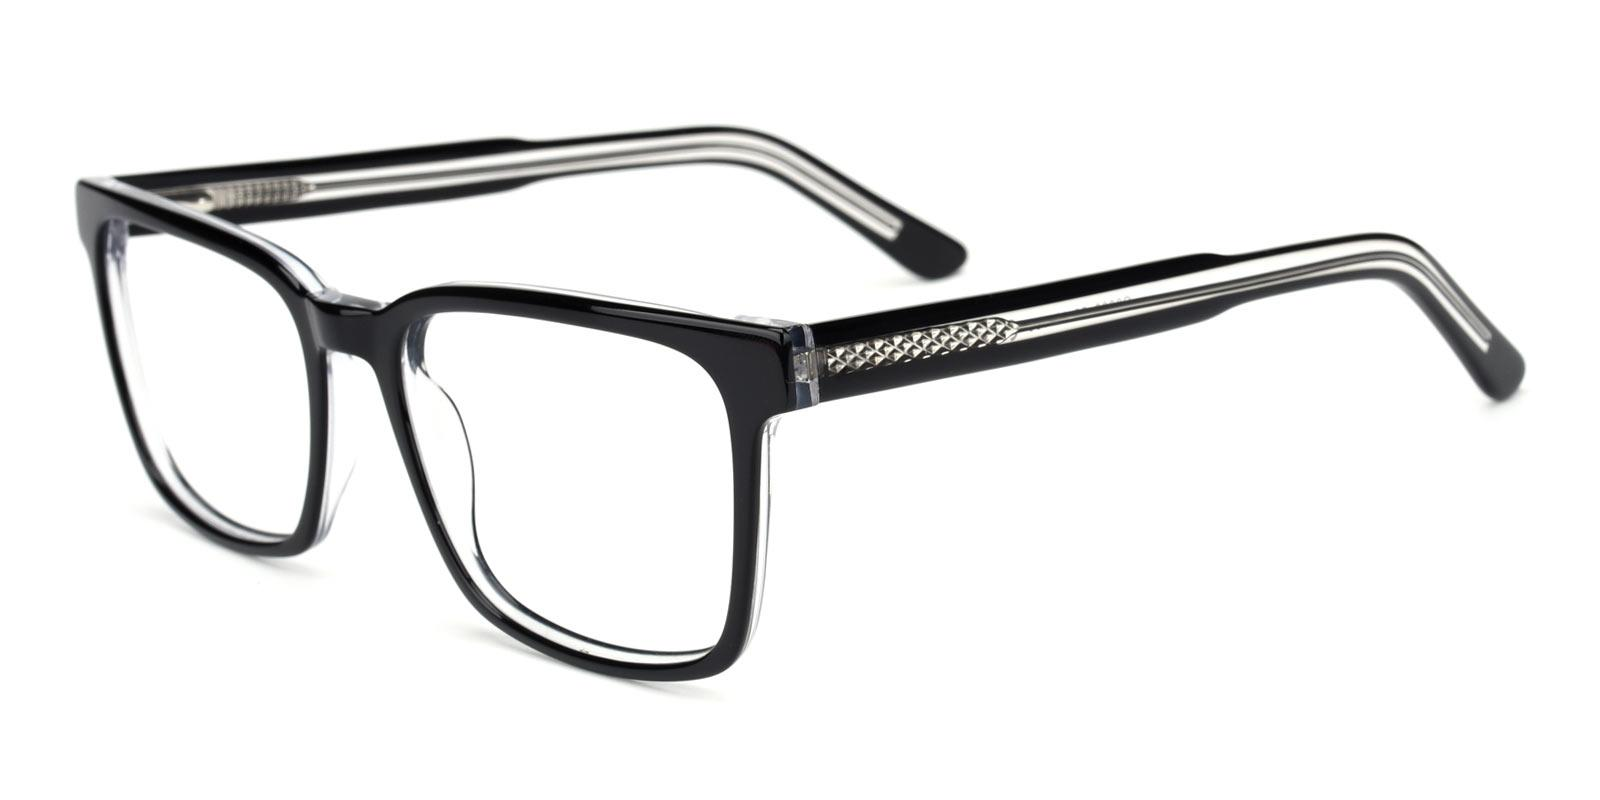 Backpack-Black-Rectangle-TR-Eyeglasses-detail